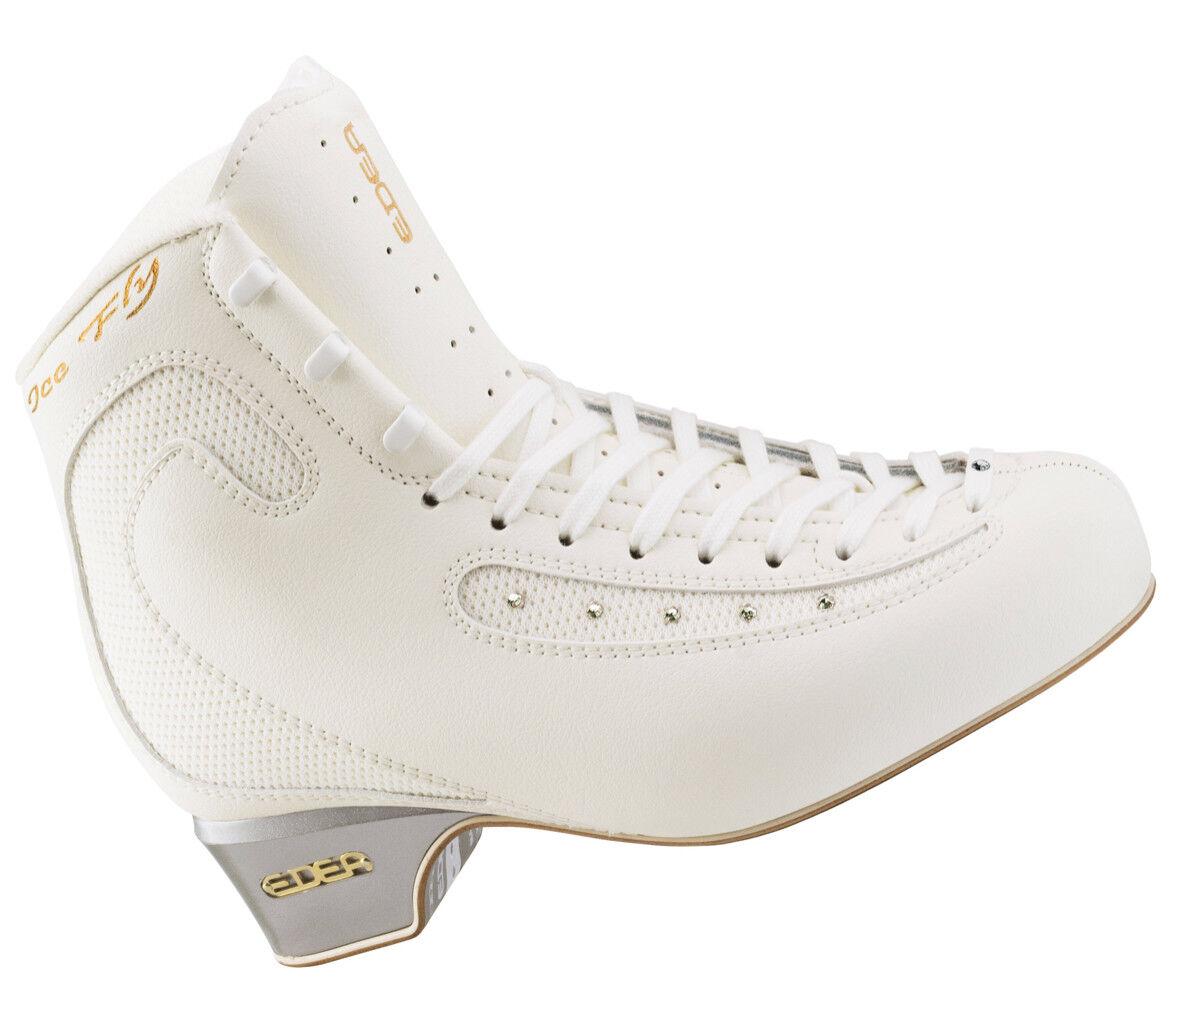 Edea hielo Mosca blancoa Patines de hielo hielo hielo patinaje botas C-Ancho  Centro comercial profesional integrado en línea.